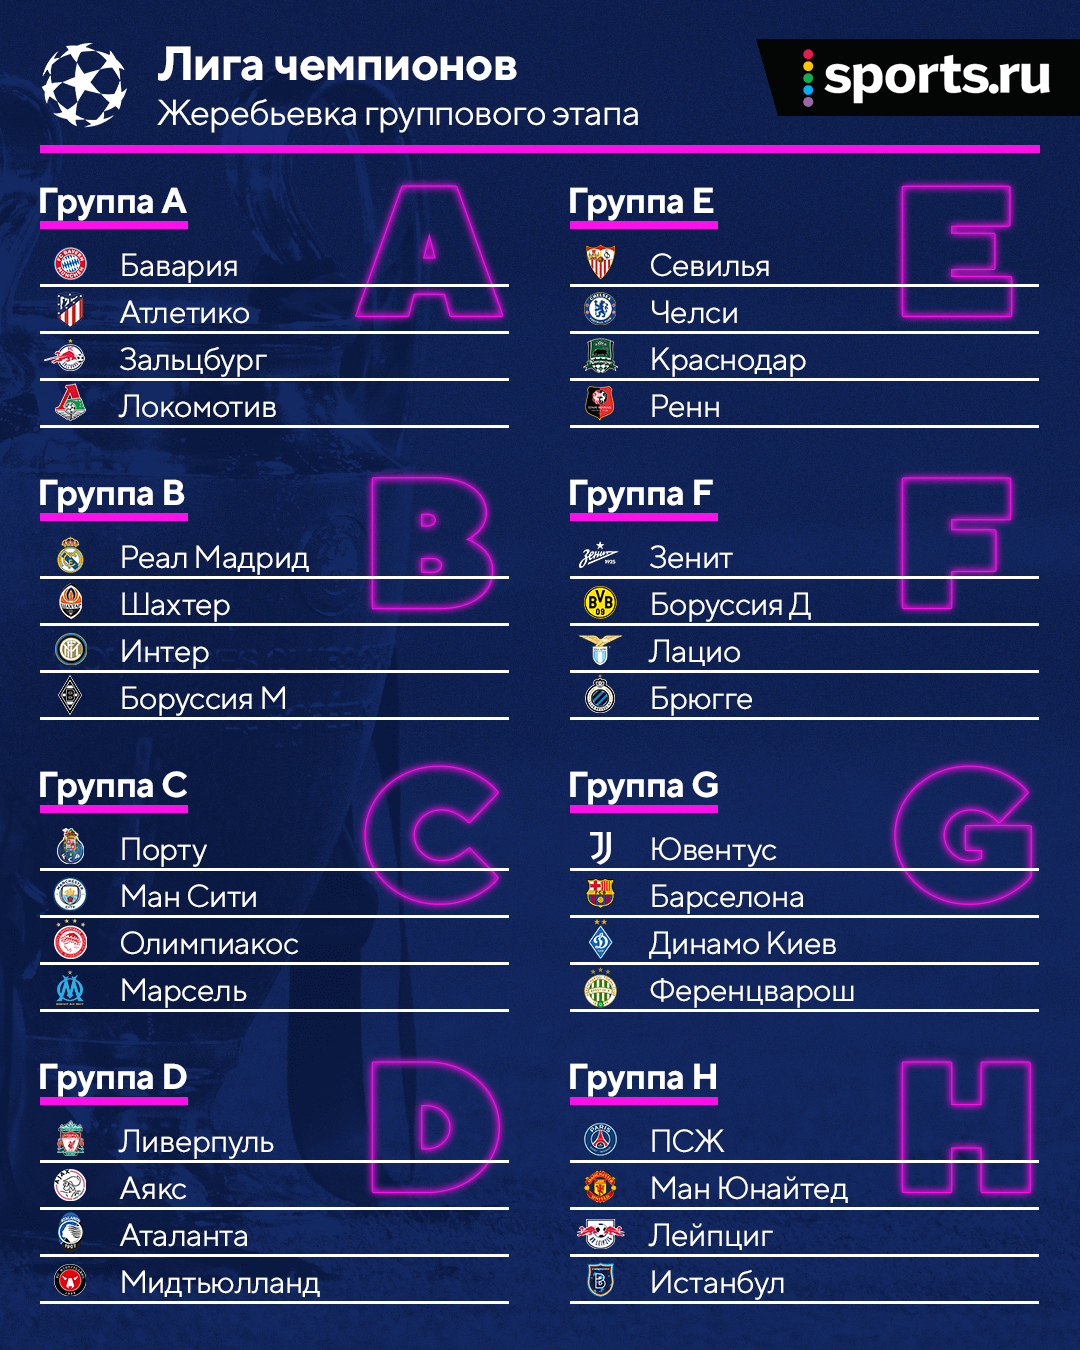 Лео – Криш, «Челси» – «Краснодар», «Бавария» – «Локо», «Боруссия» – «Зенит»: все группы ЛЧ